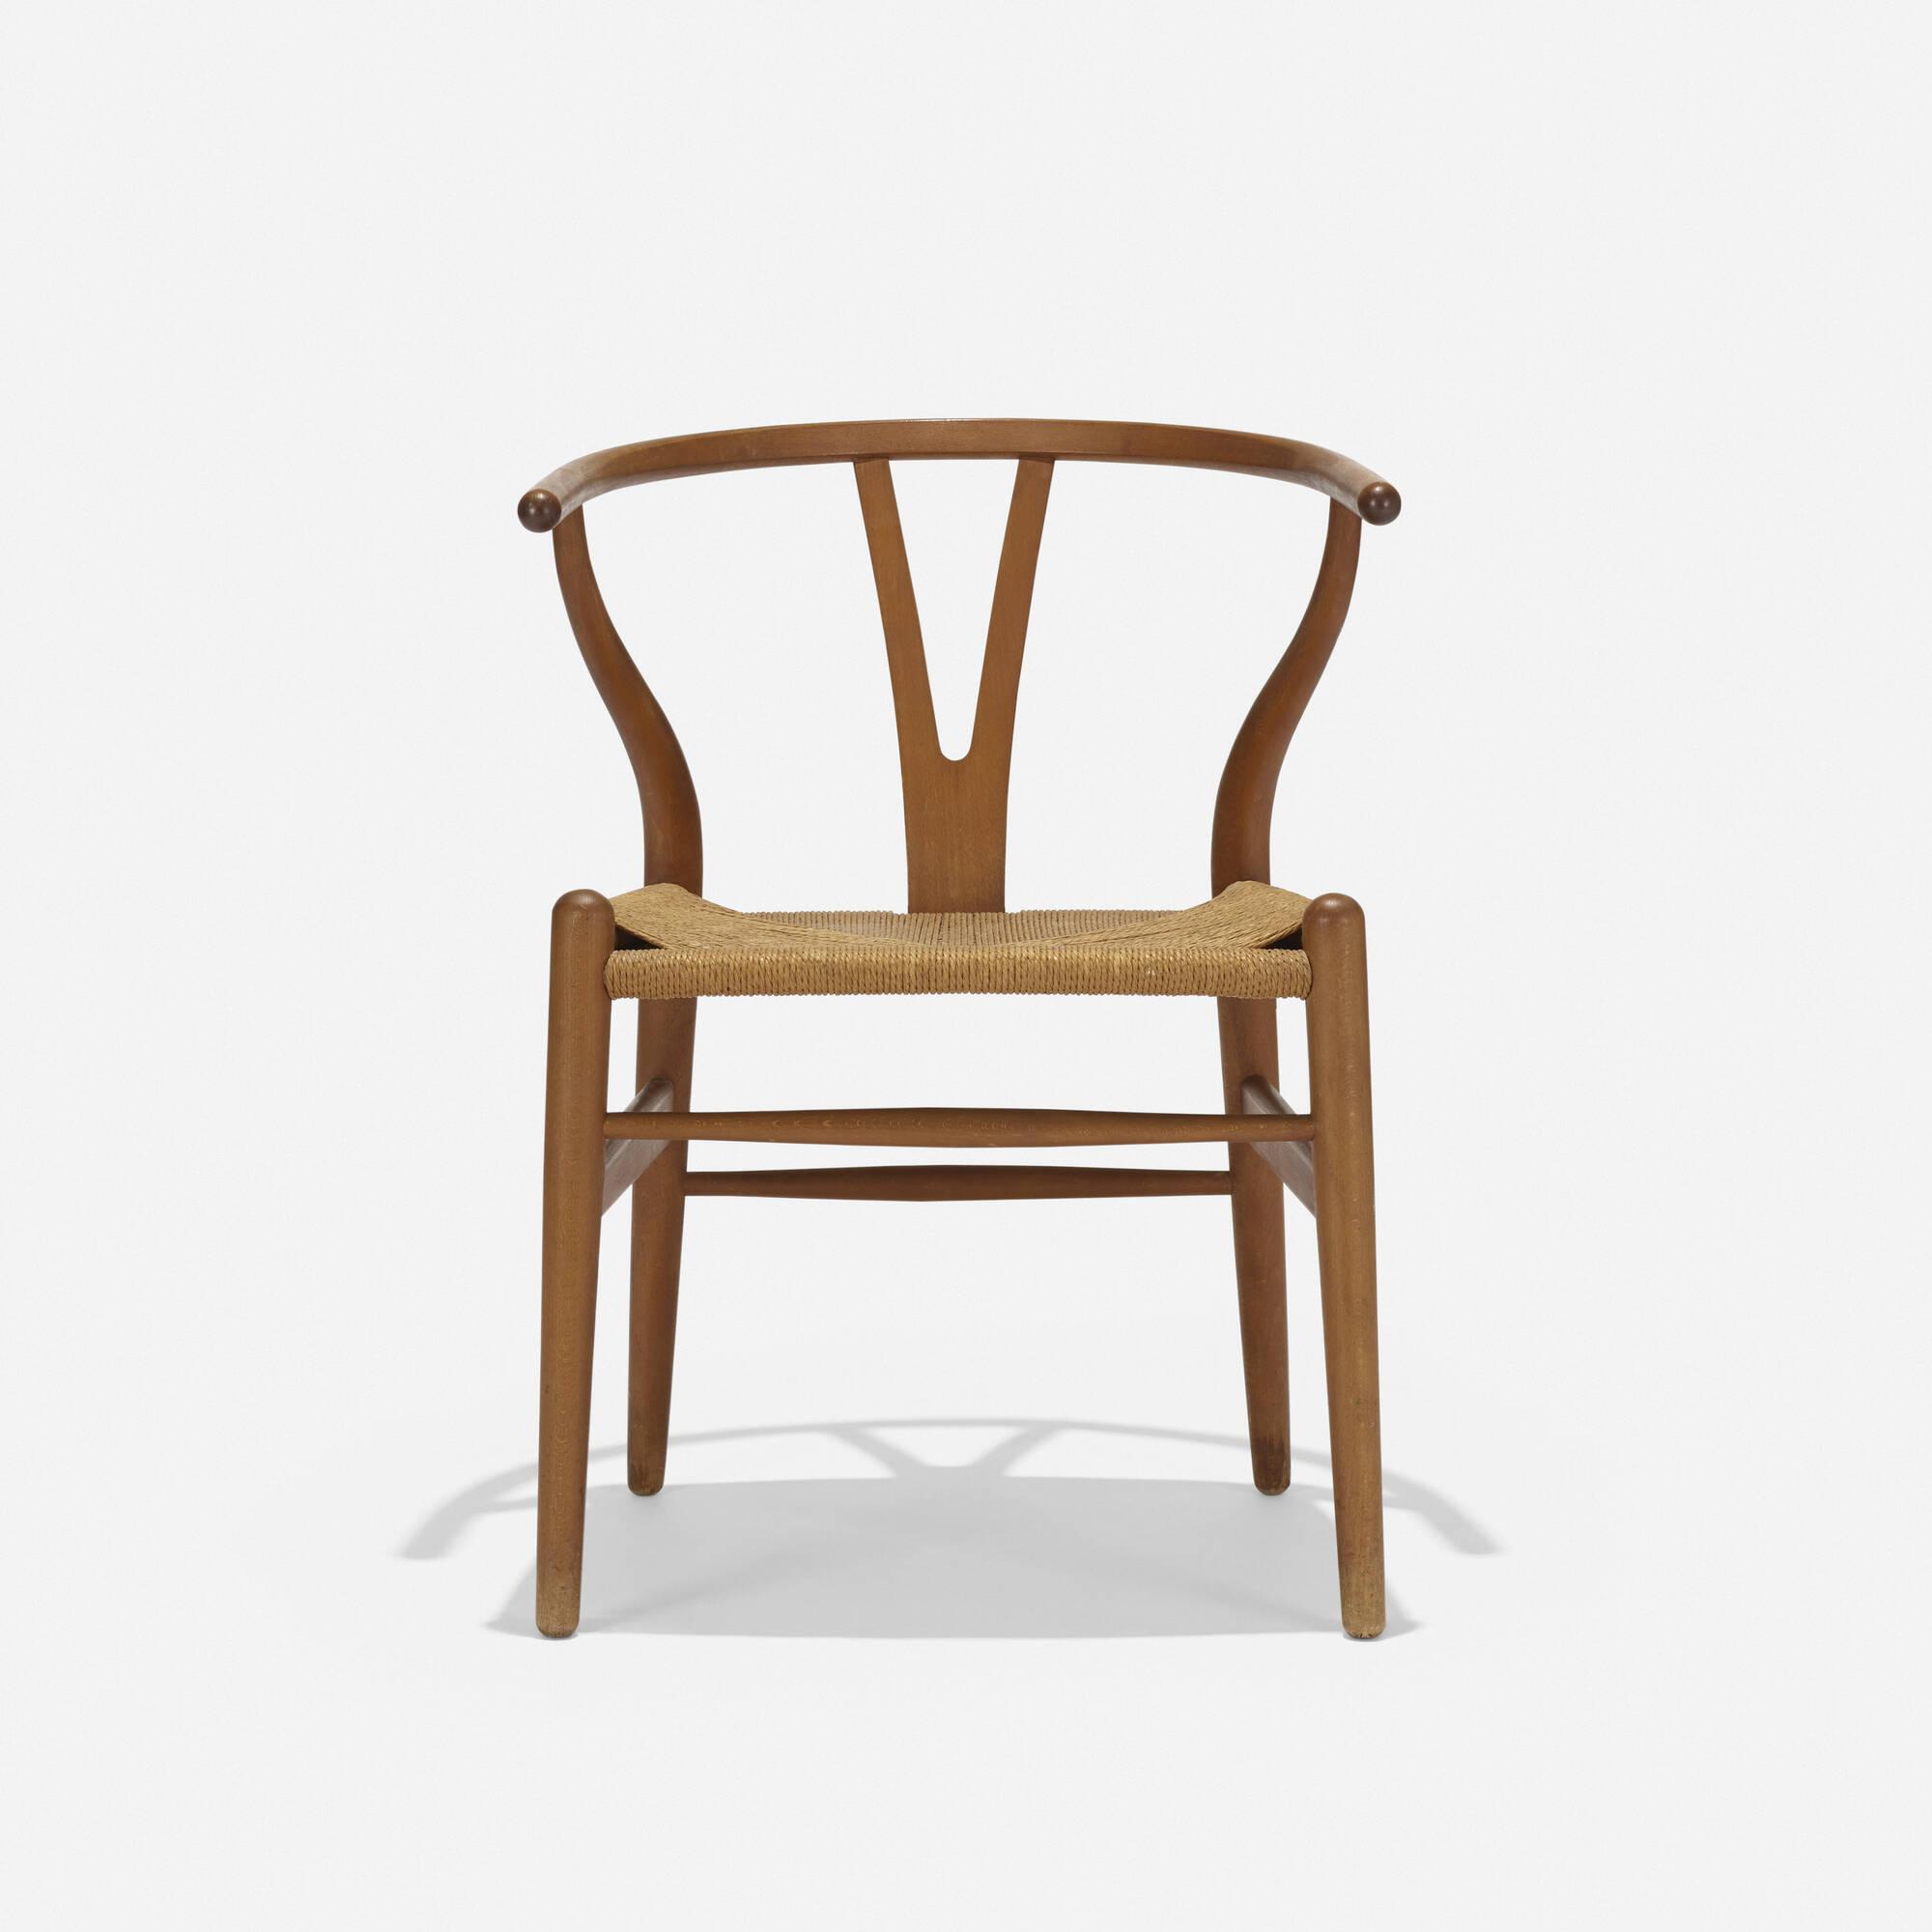 407: Hans J. Wegner / Wishbone Chair, model CH24 (1 of 3)